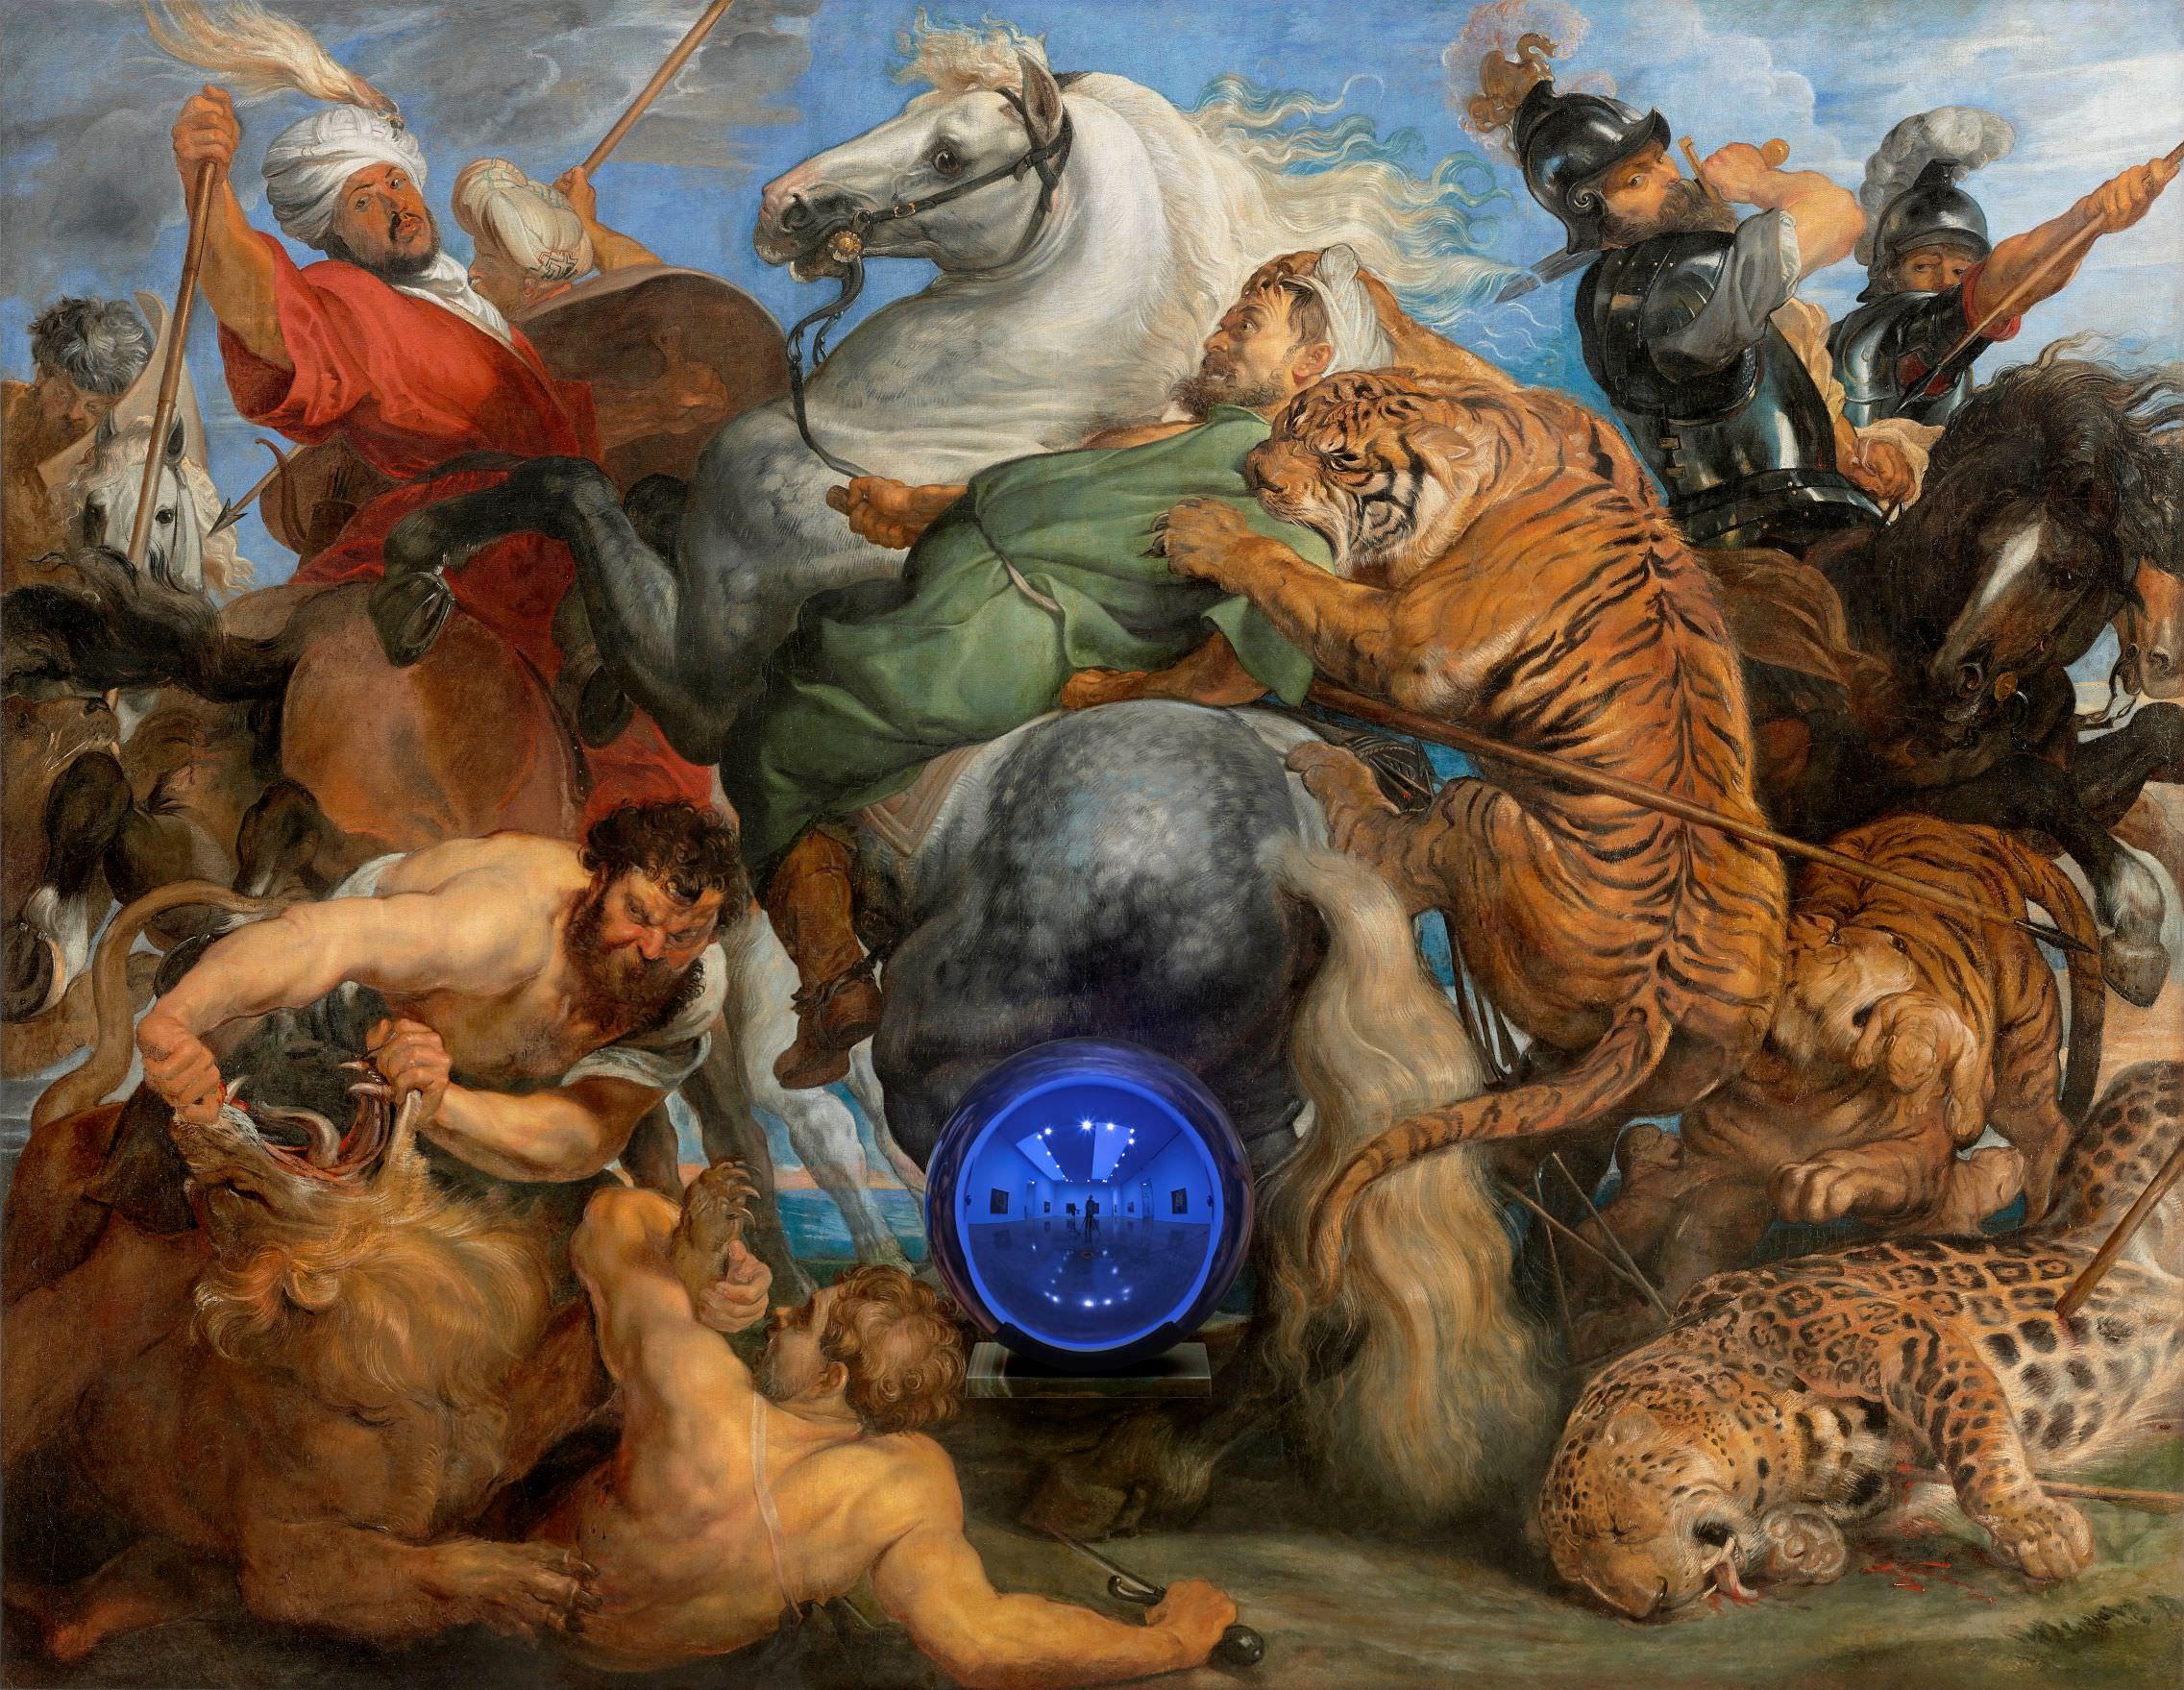 Jeff Koons (b. 1955); Gazing Ball (Rubens Tiger Hunt); 2015; Oil on canvas, glass, and aluminium; 163.8 x 211.1 x 37.5 cm; Collection of the artist © Jeff Koons. Photo: Tom Powel Imaging. Courtesy Gagosian